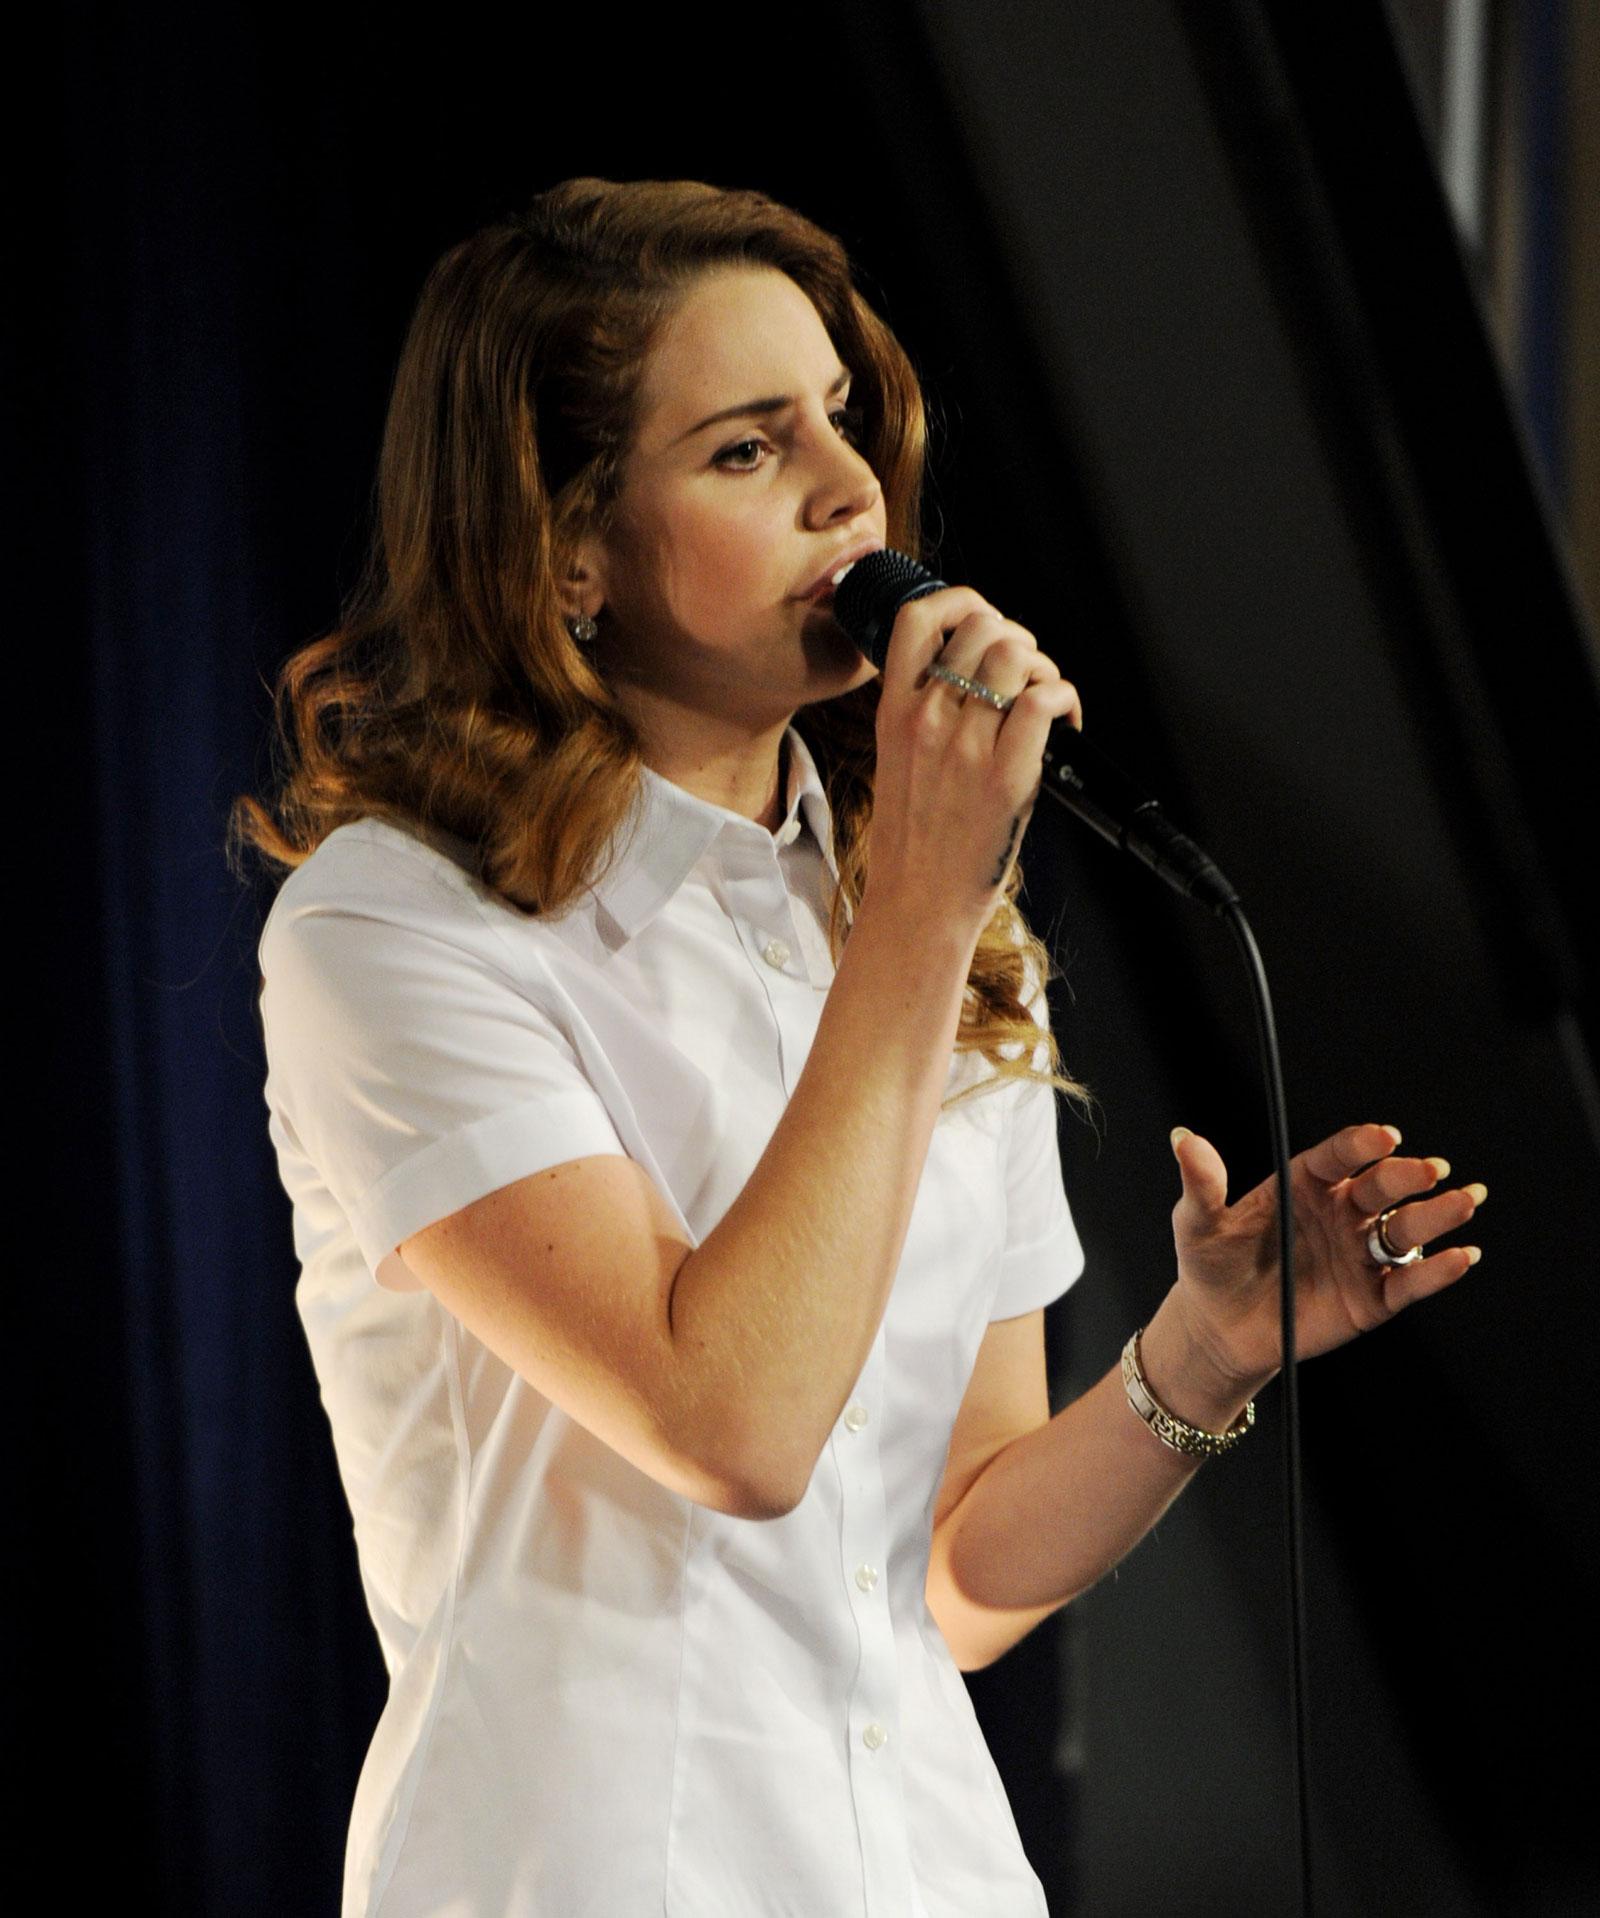 Lana Del Rey Perfoms at Amoeba Records Store - HawtCelebs